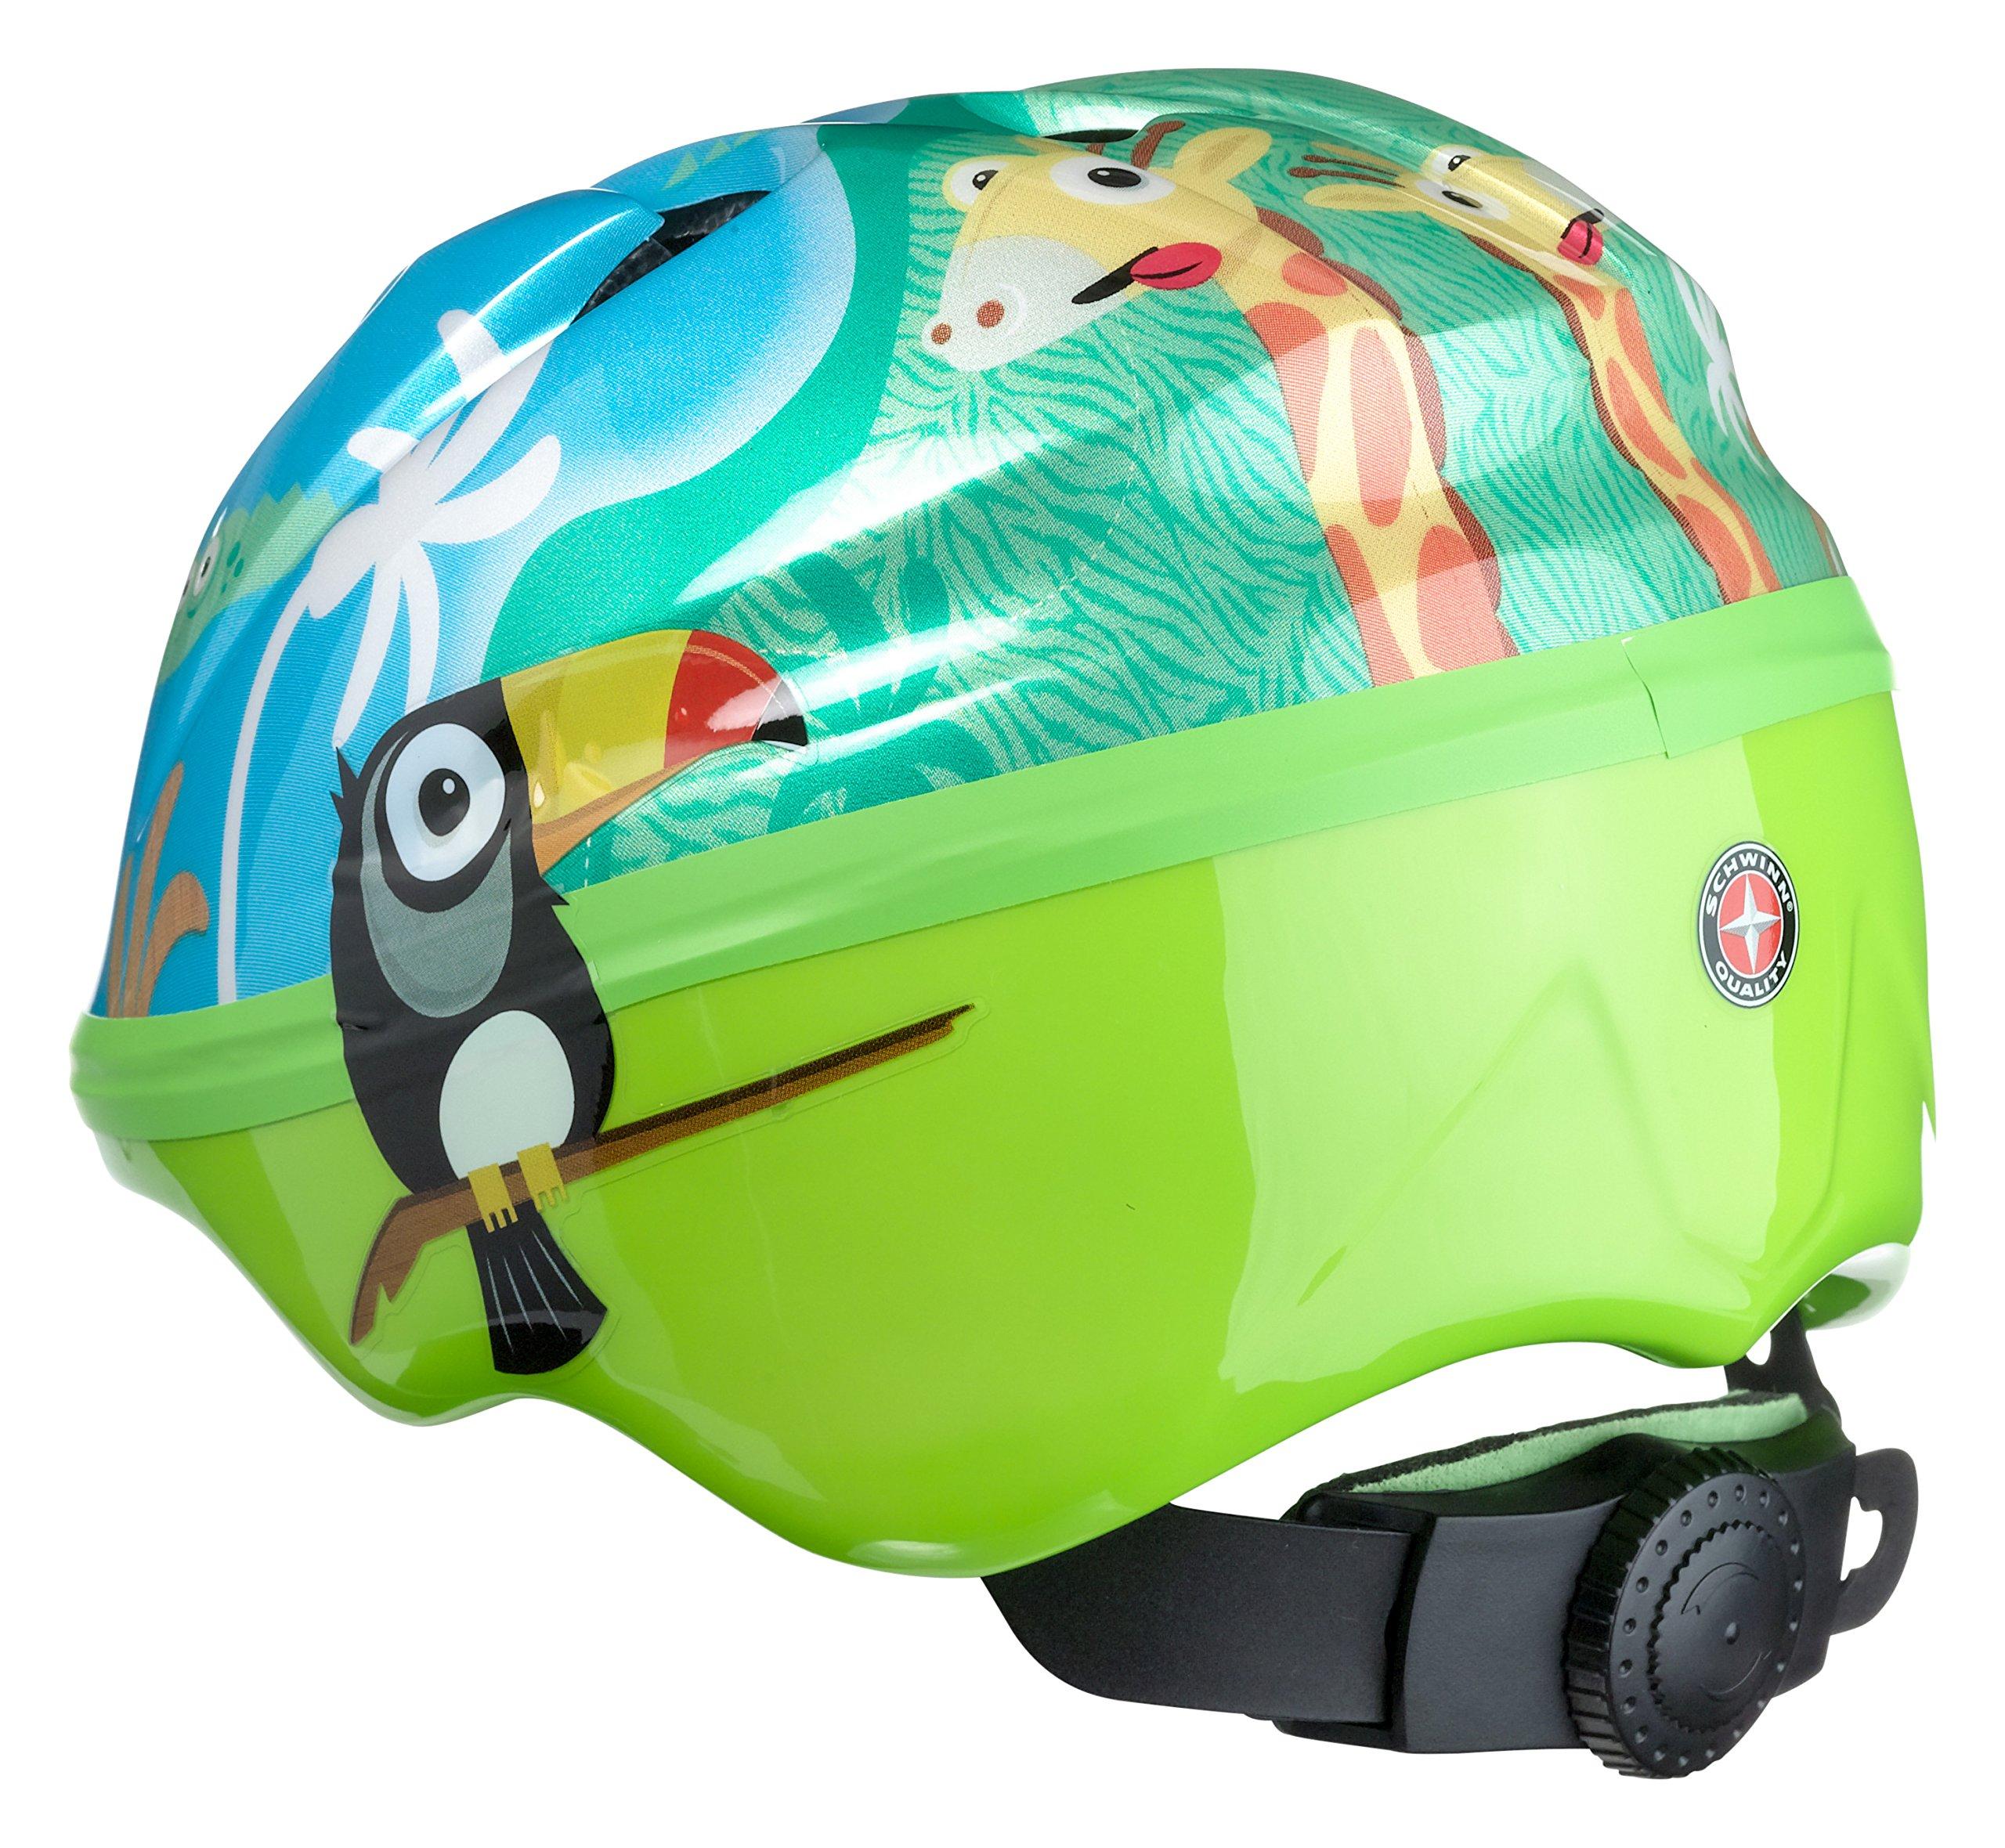 Schwinn Infant Helmet, Jungle by Schwinn (Image #2)